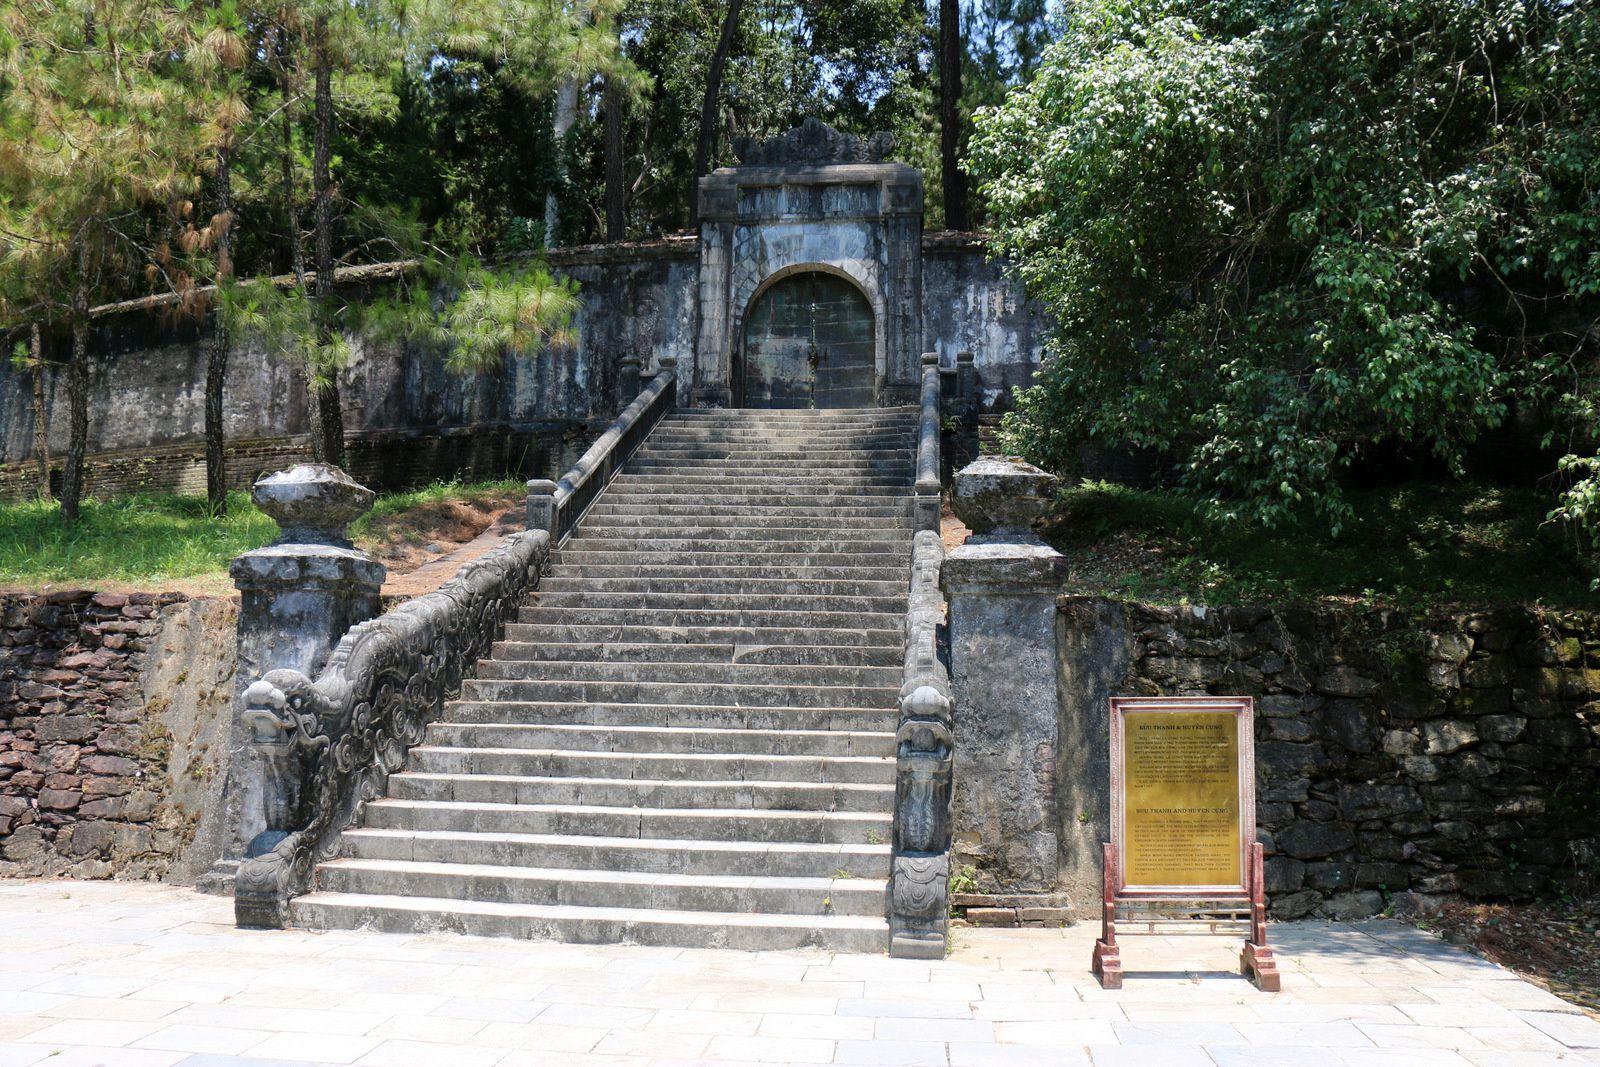 Buu Thanh (l'enceinte du tombeau), tombeau de l'empereur Minh Mang